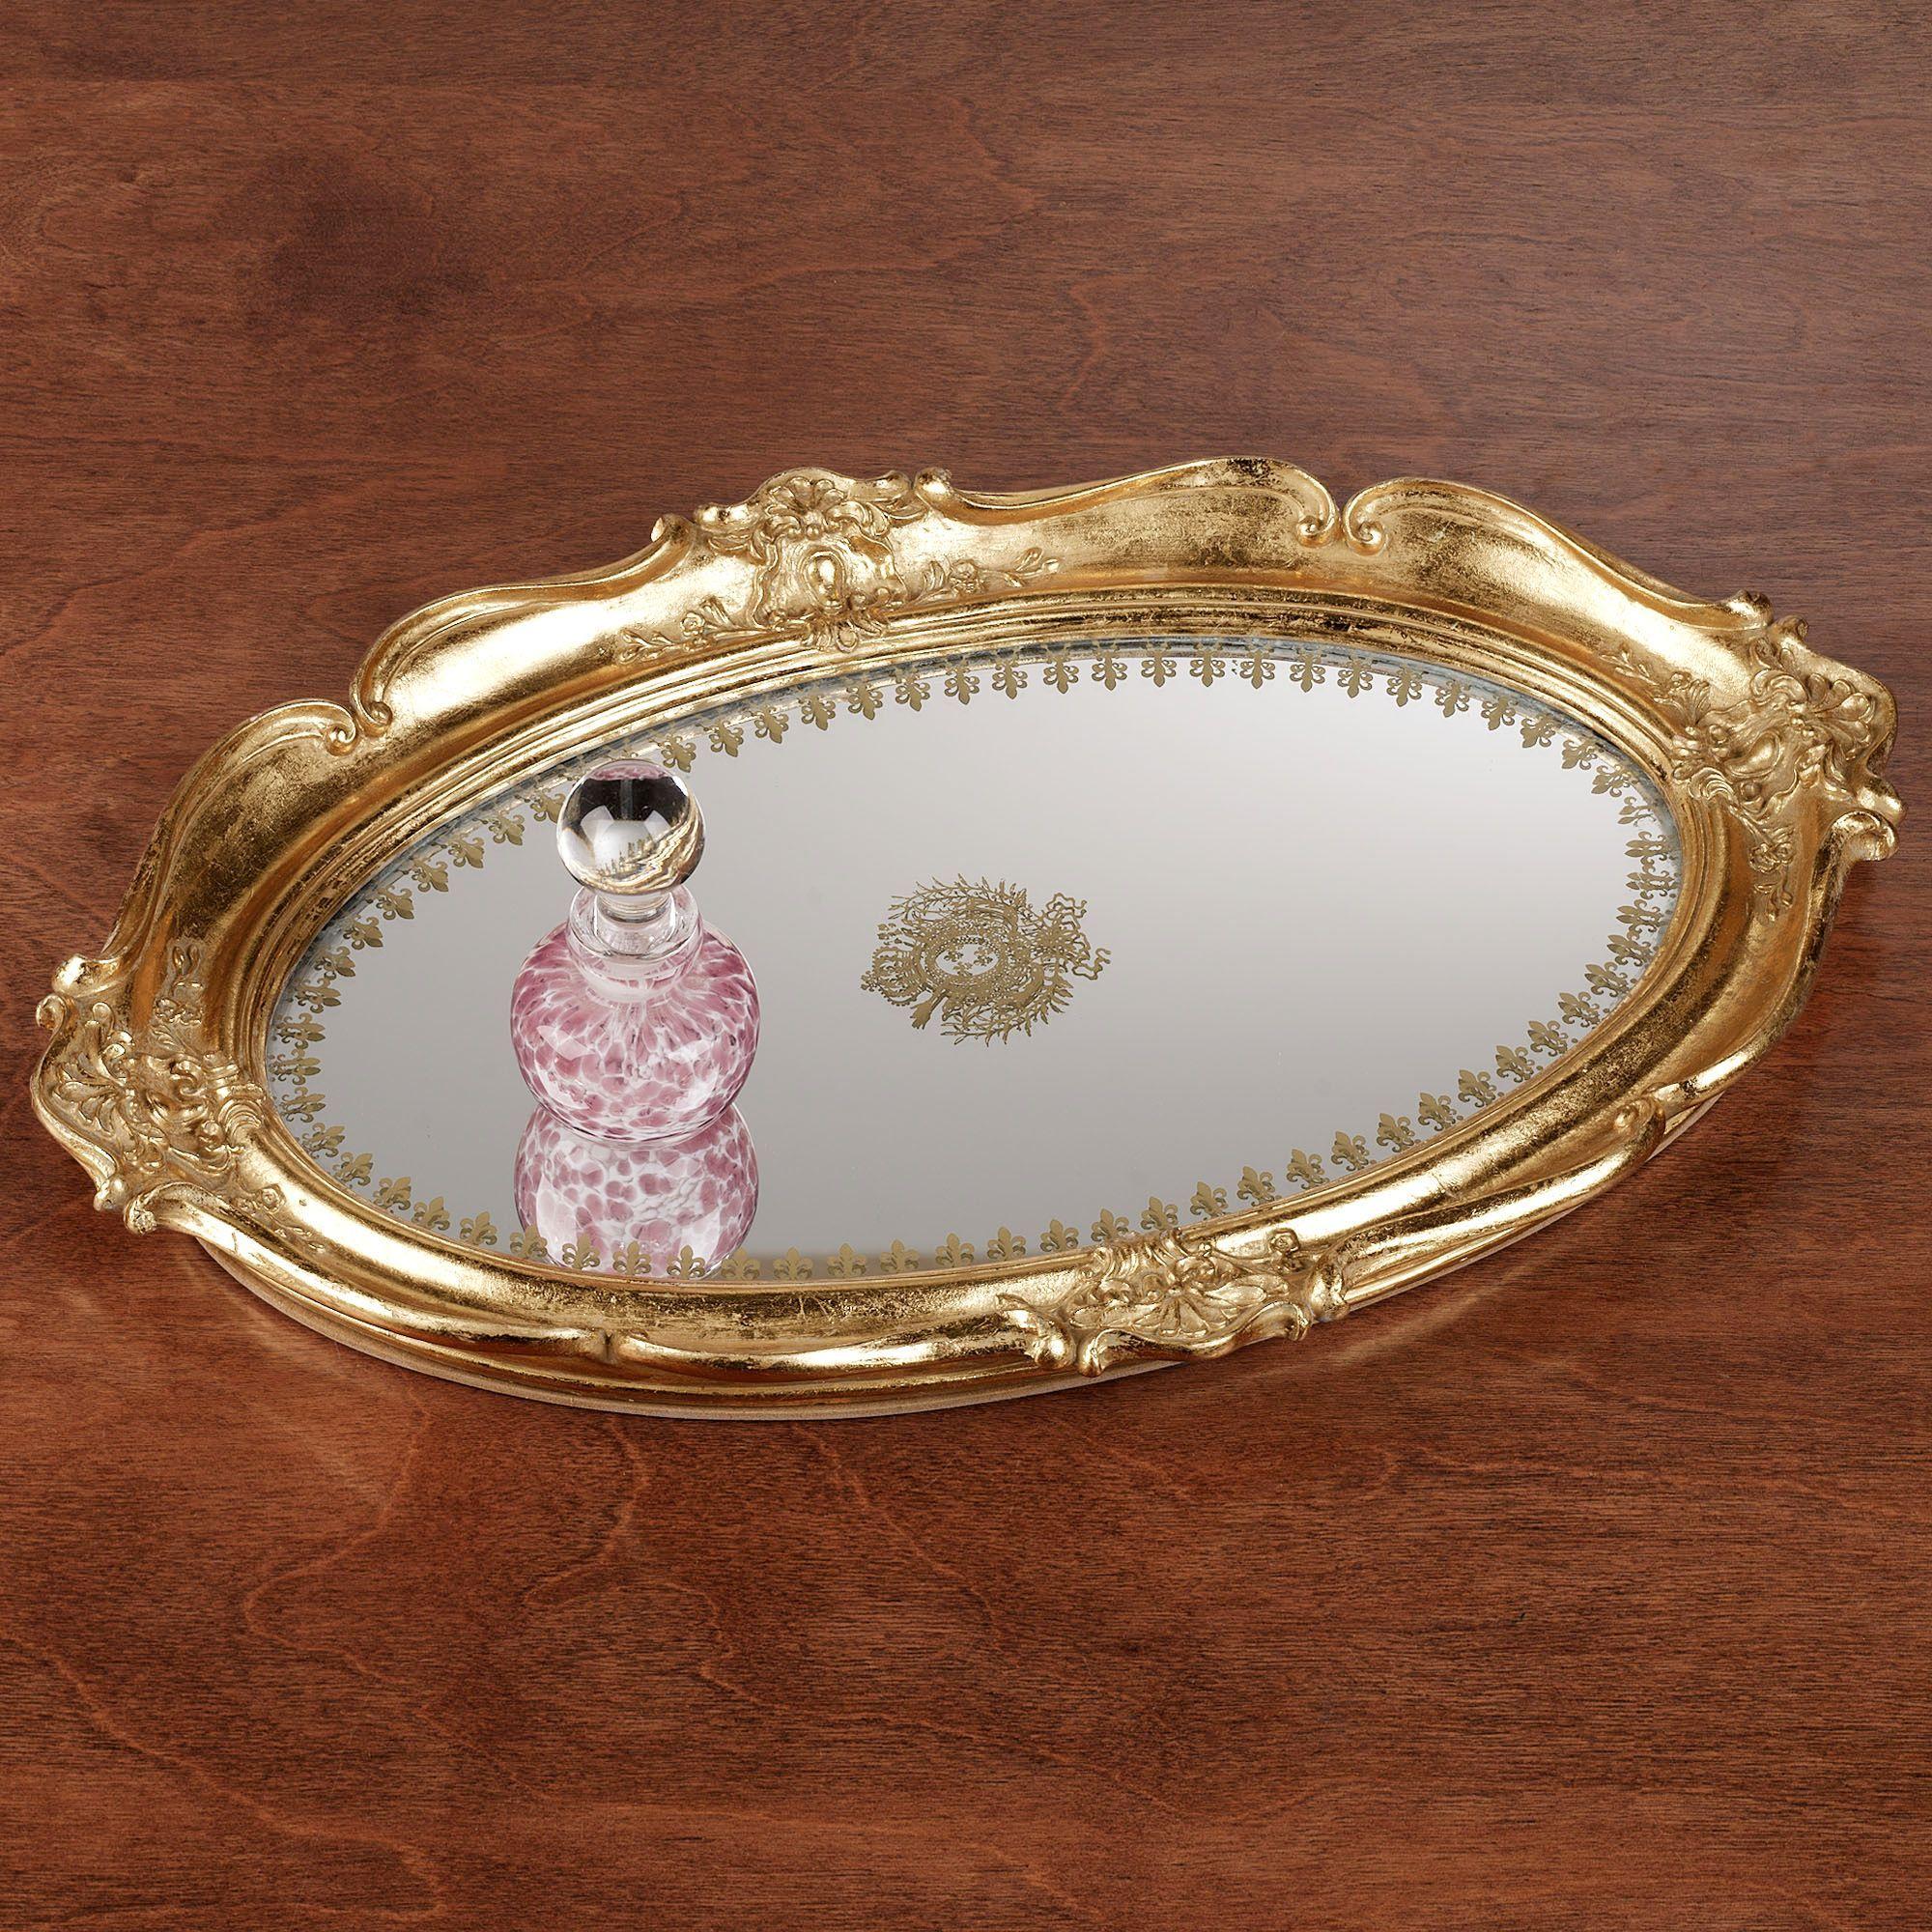 White vanity mirror vintage mirror vanity tray vintage mirrored - Adina Gold Scalloped Mirrored Vanity Tray Mirrored Vanityvanity Trayvintage